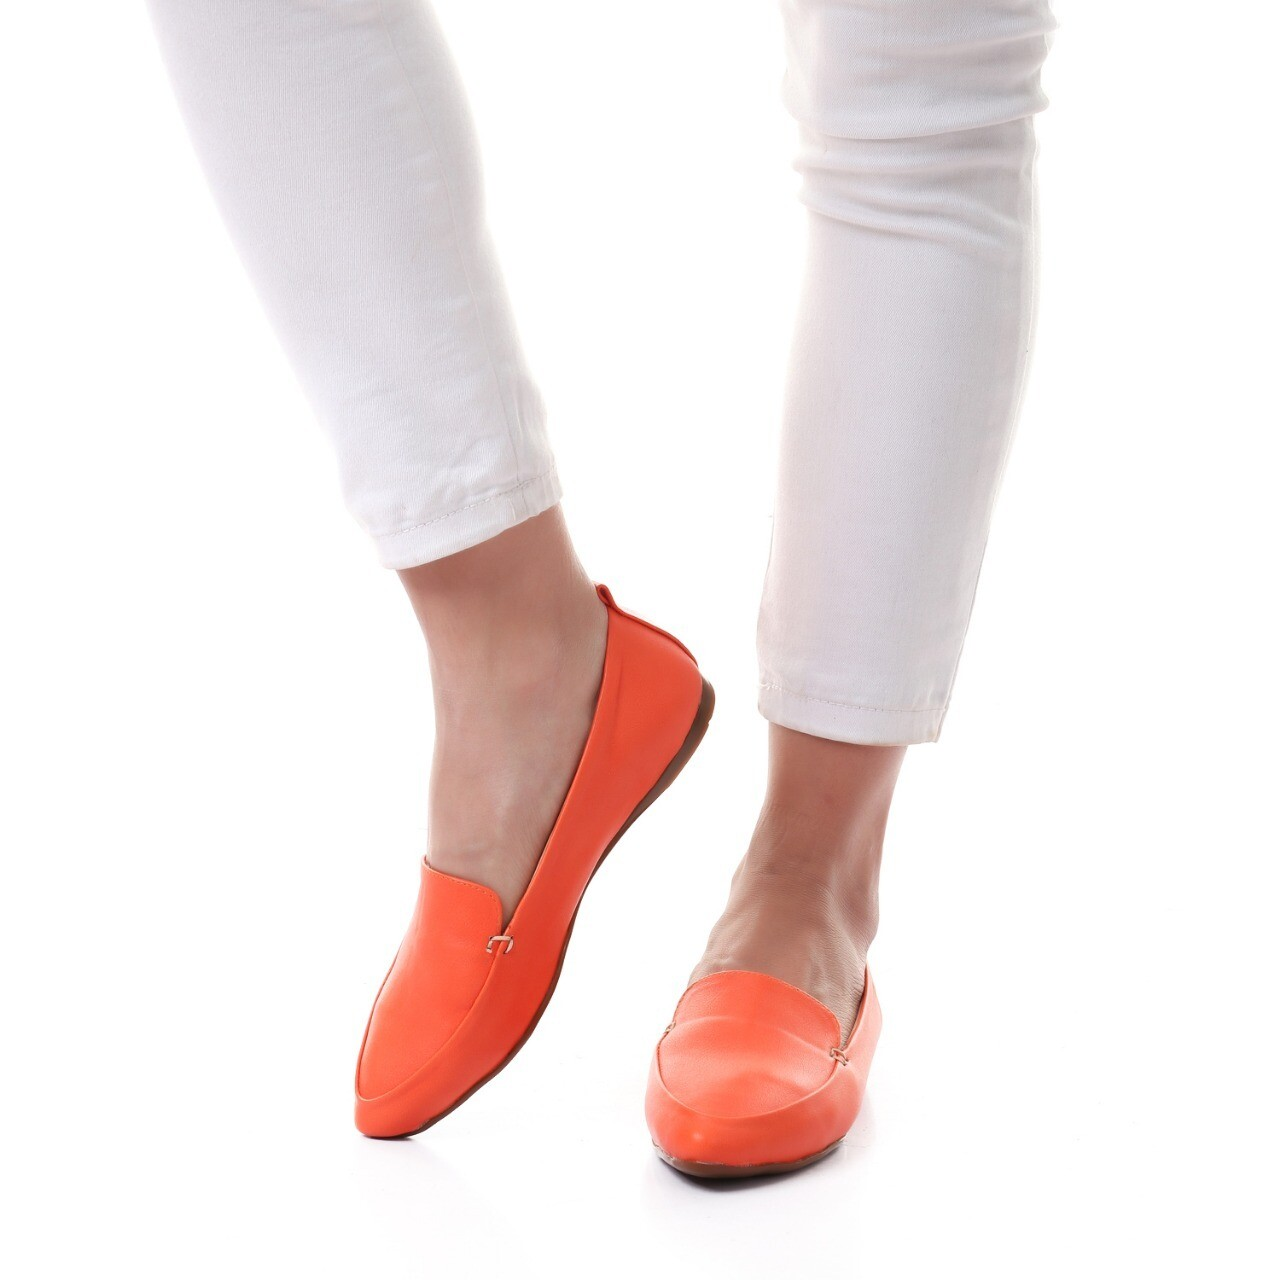 3464 Ballet Flat Shoes - orange